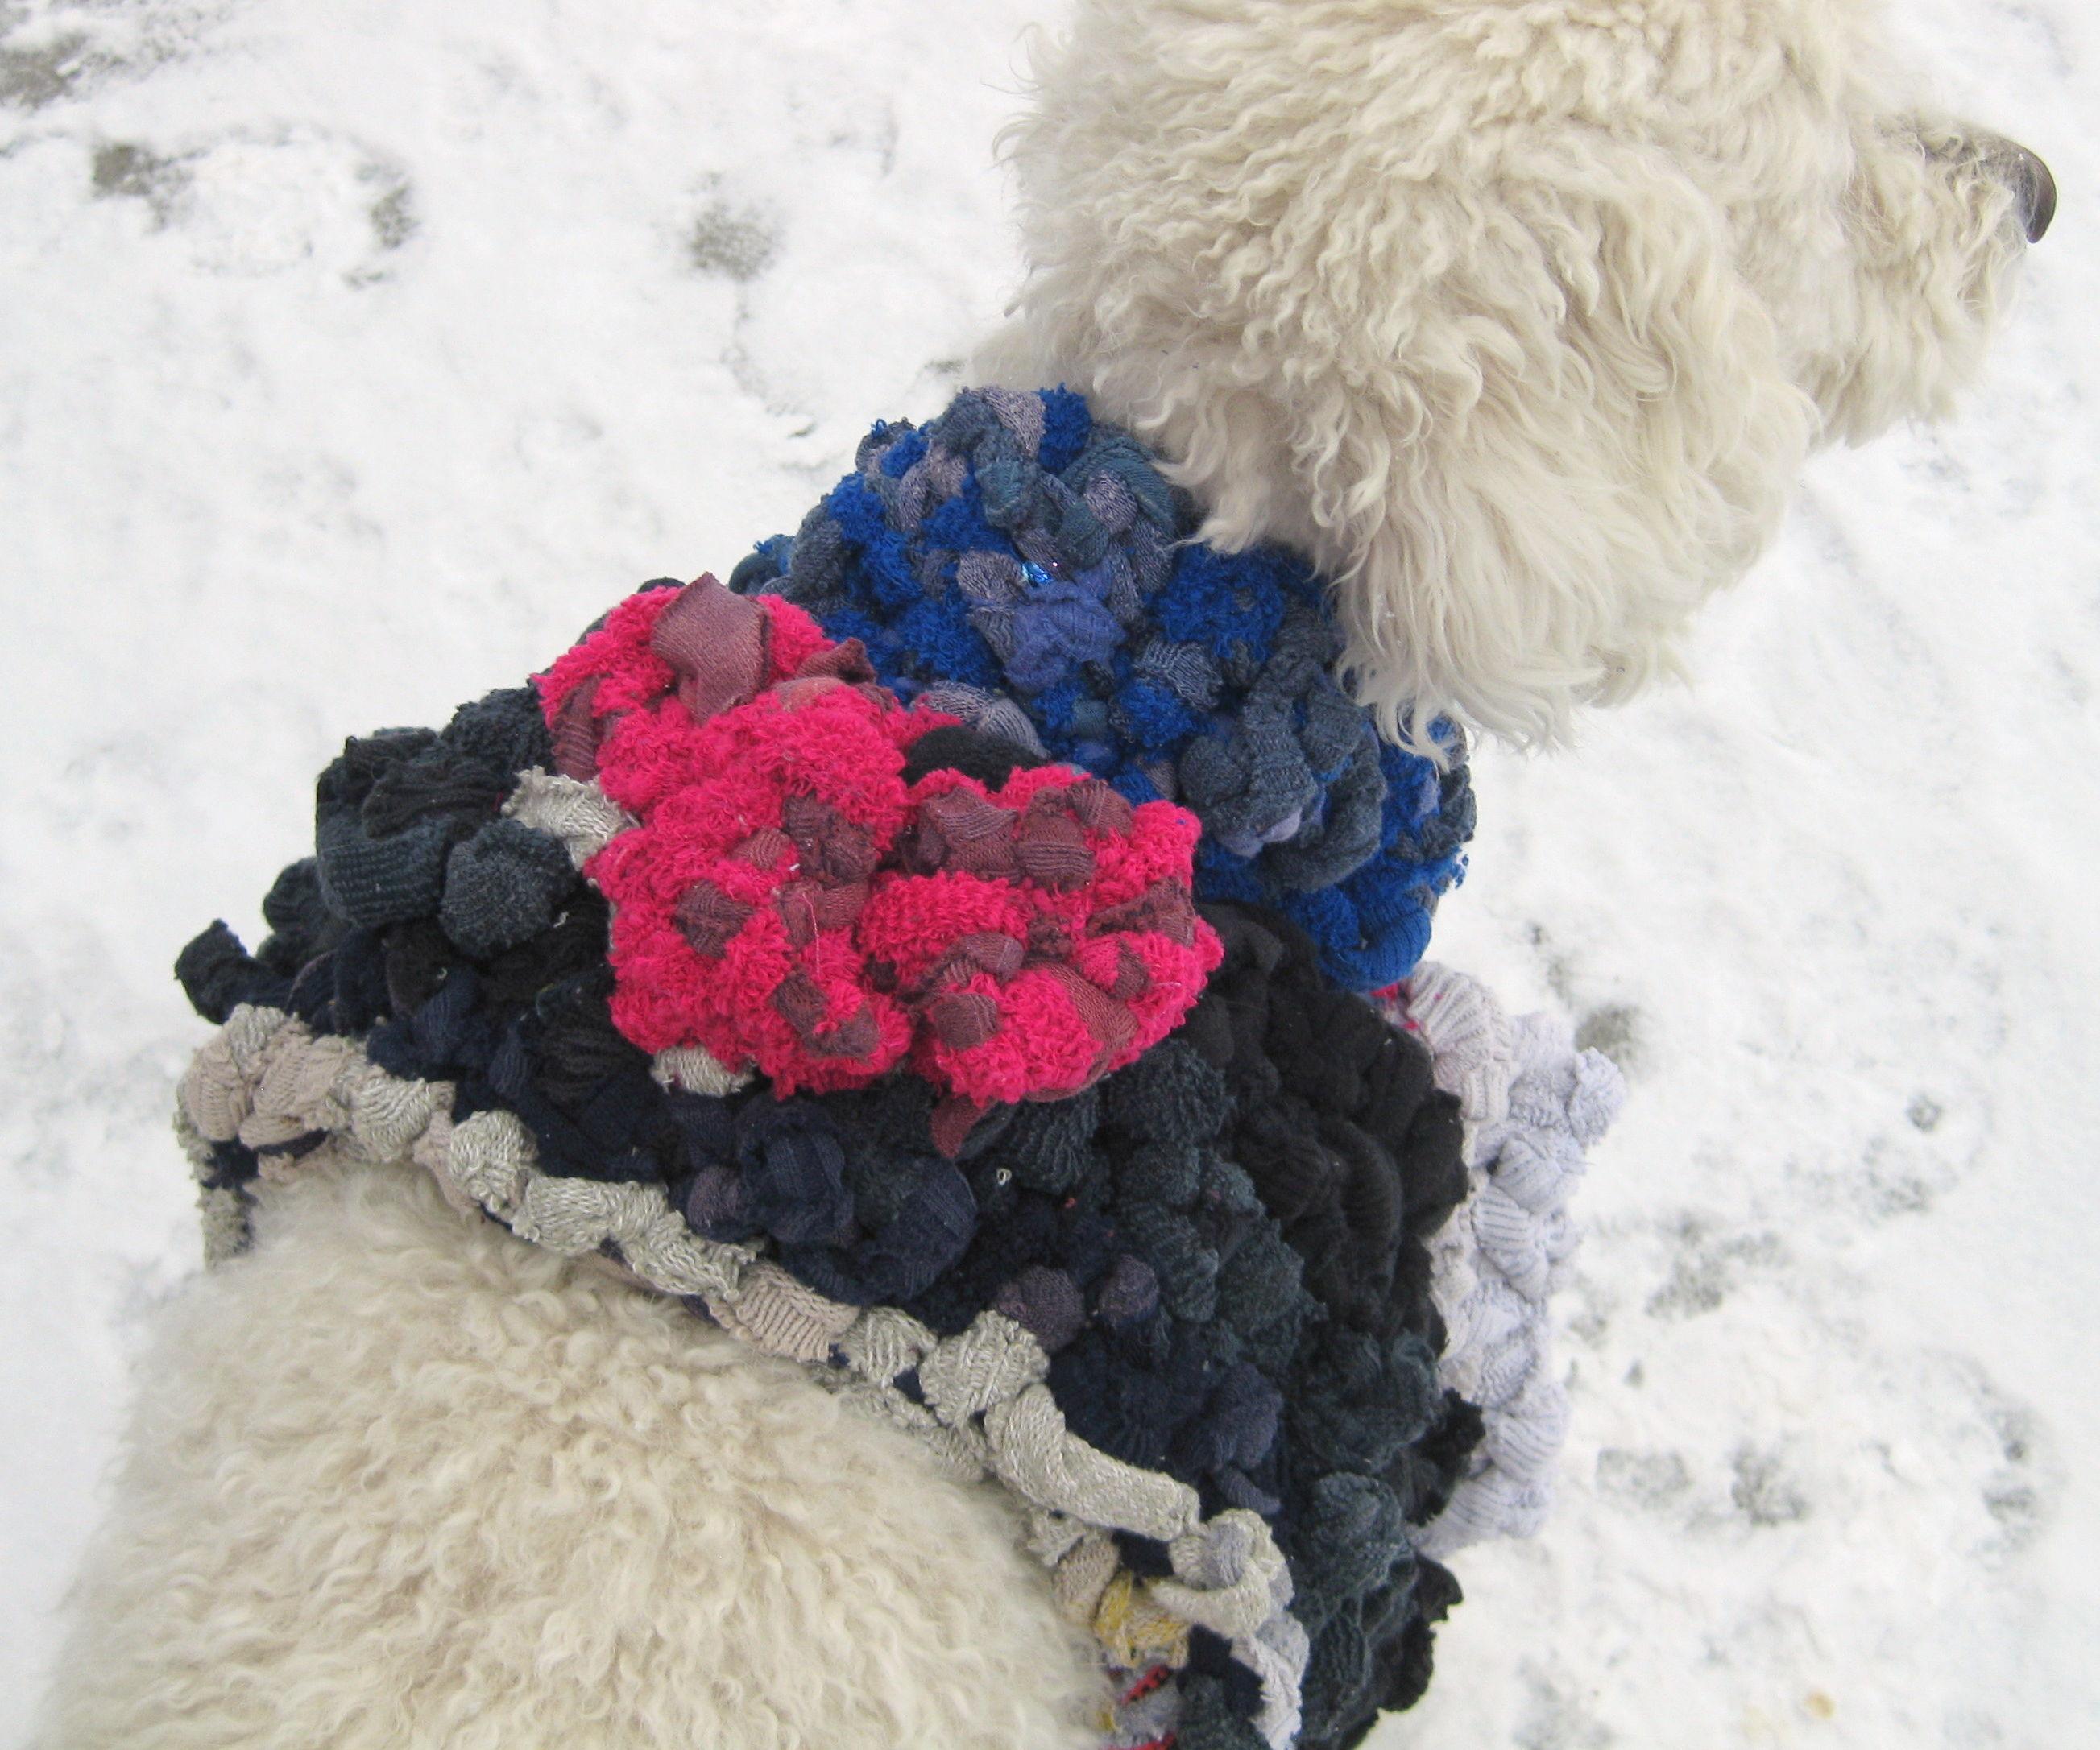 Crochet Dog Sweater from Old Socks